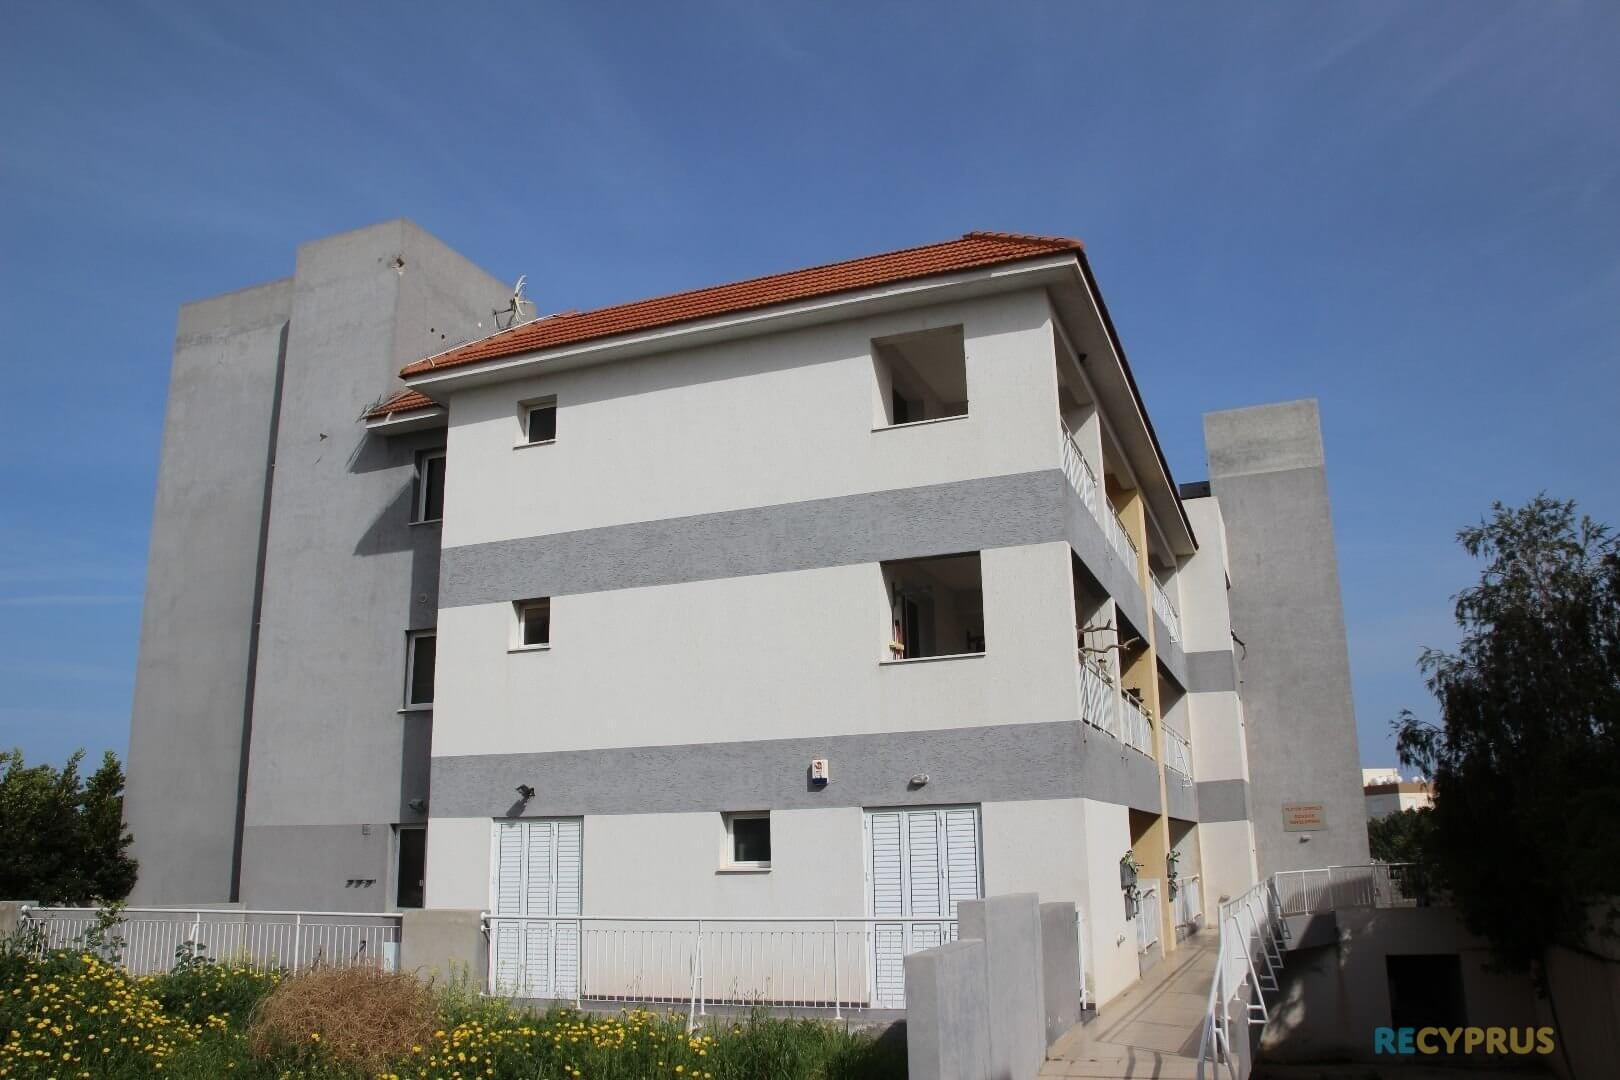 Apartment for sale Kapparis Famagusta Cyprus 1 3519